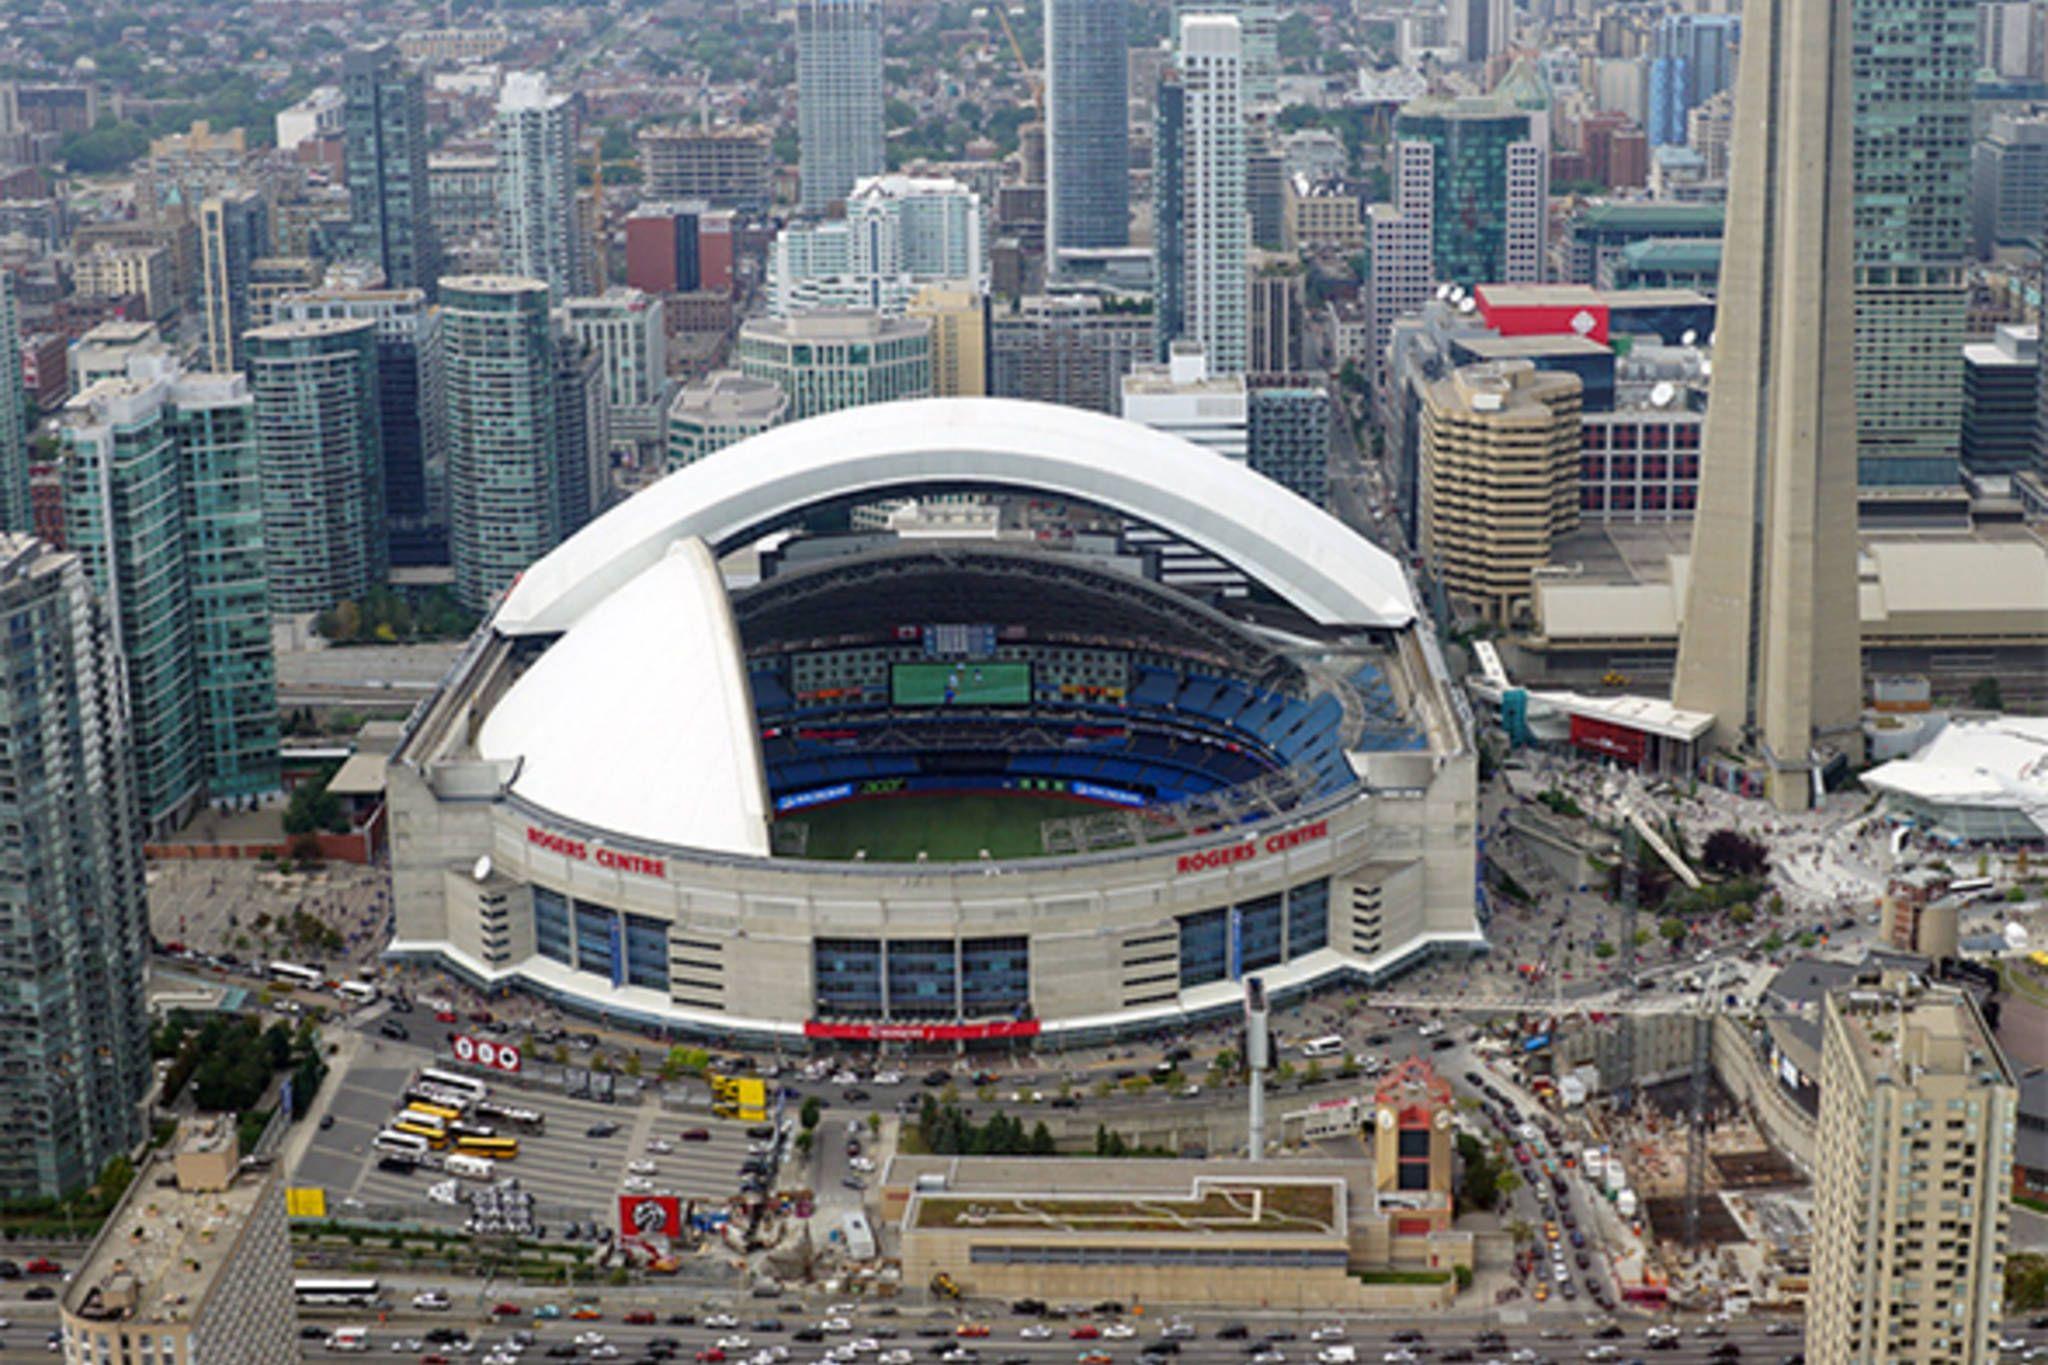 Rogers Center Skydome 1 Blue Jays Way Toronto On M5v 1j1 Canada Capacity 53 506 Rogers Centre Toronto Skyline Downtown Toronto